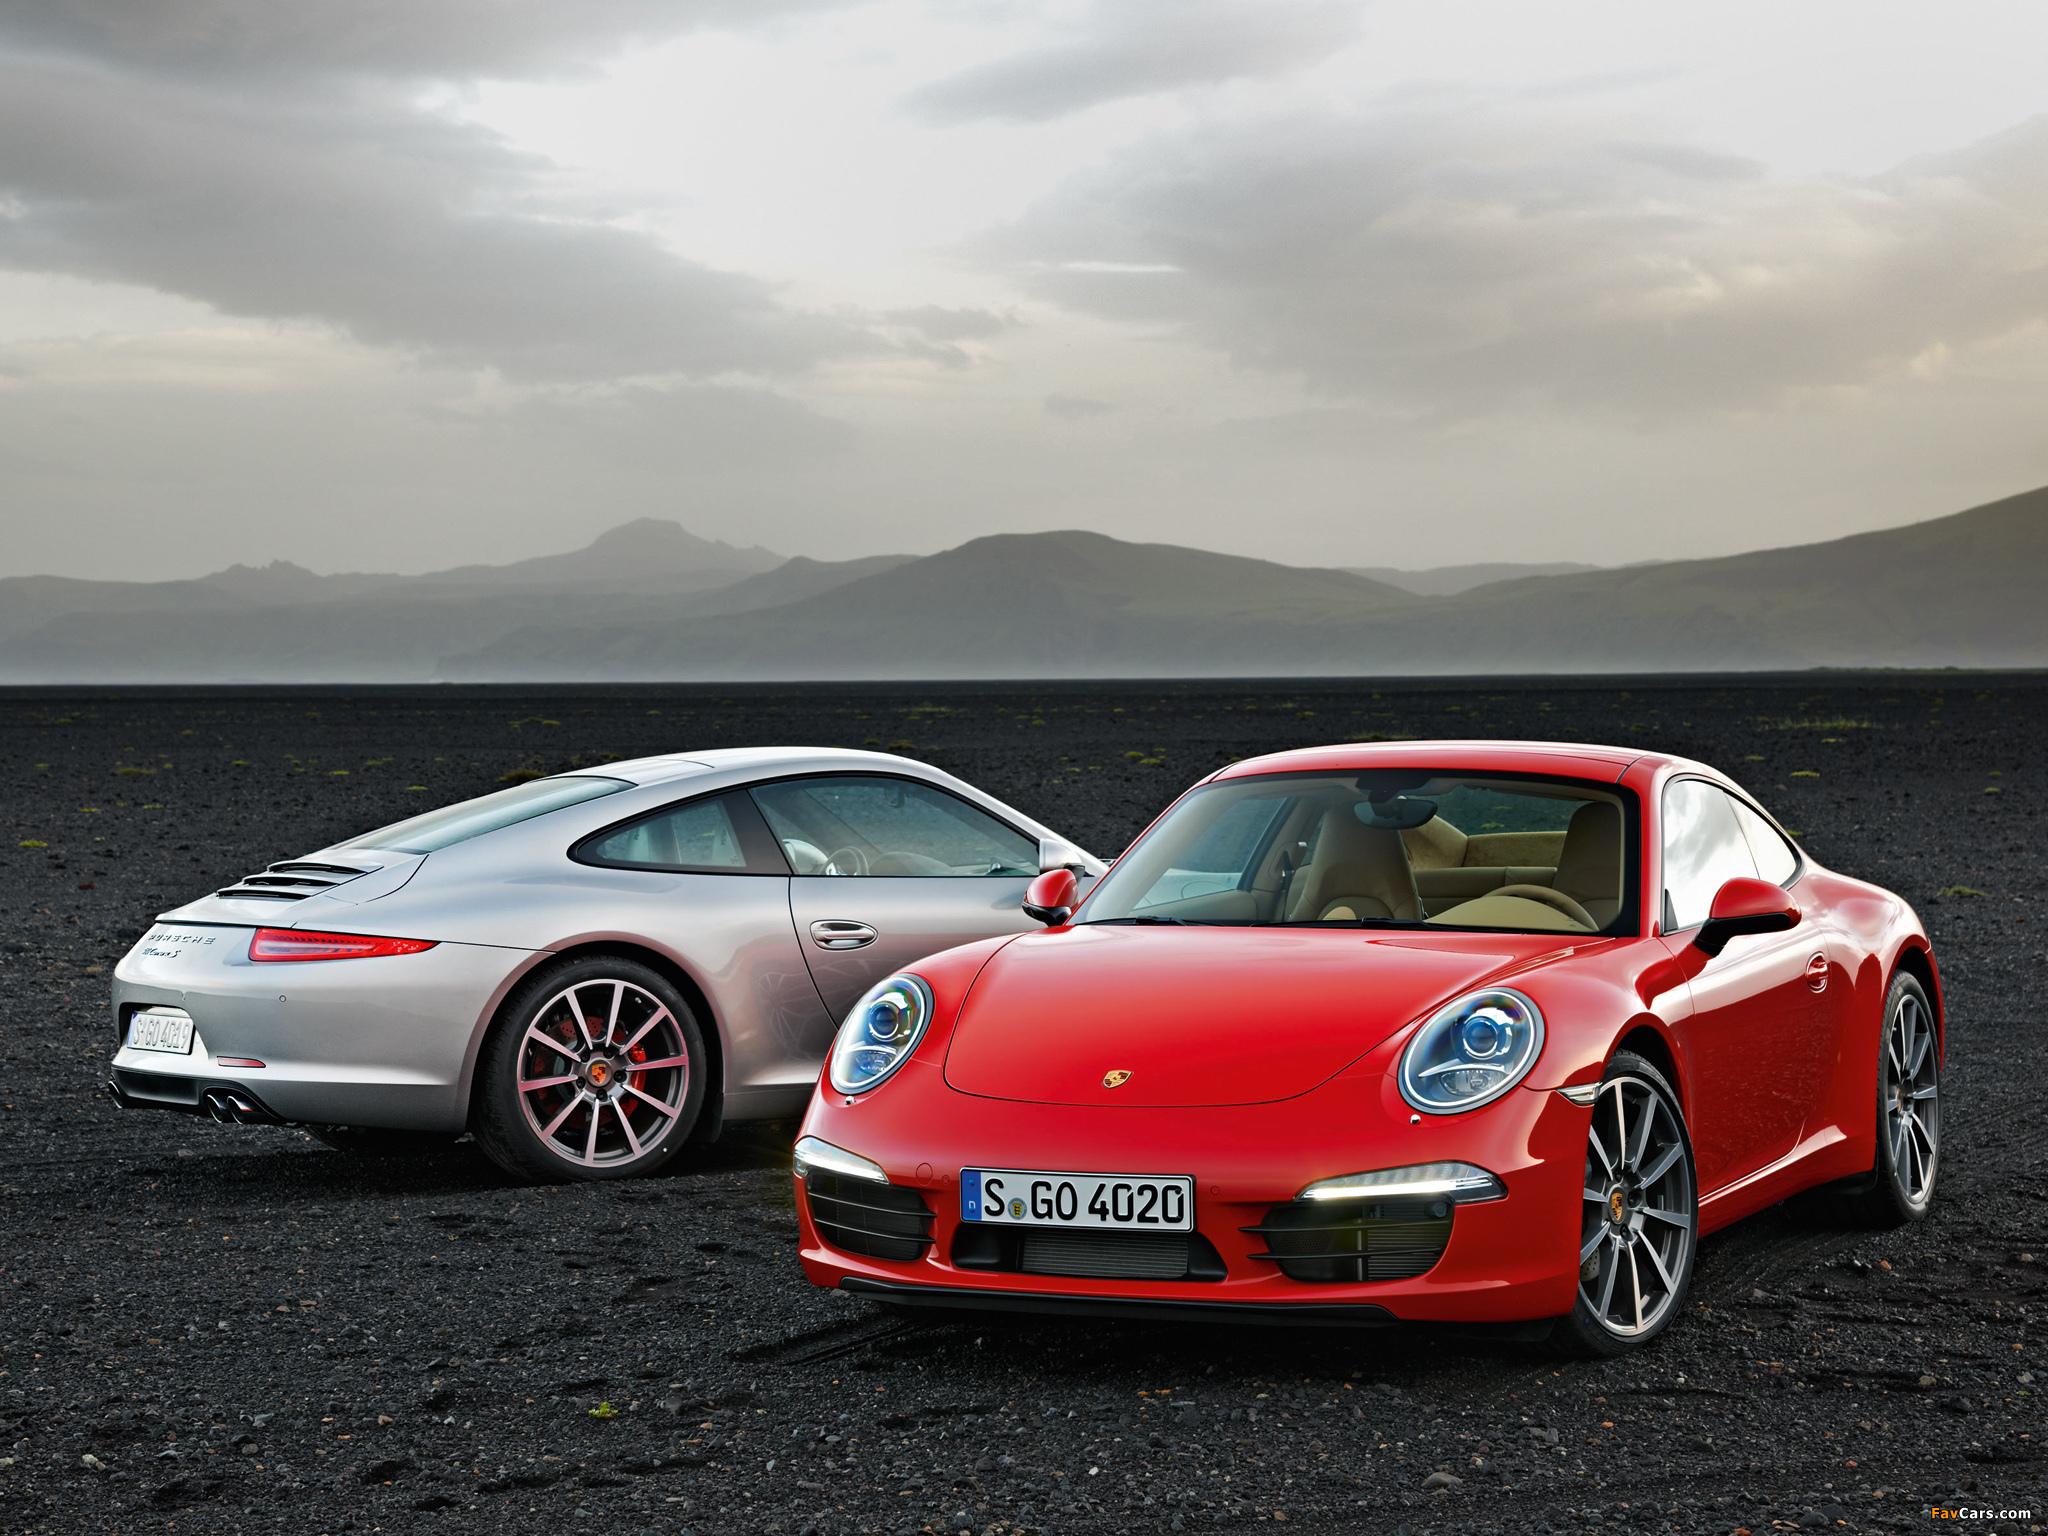 Porsche Panamera 911  № 2370056 загрузить